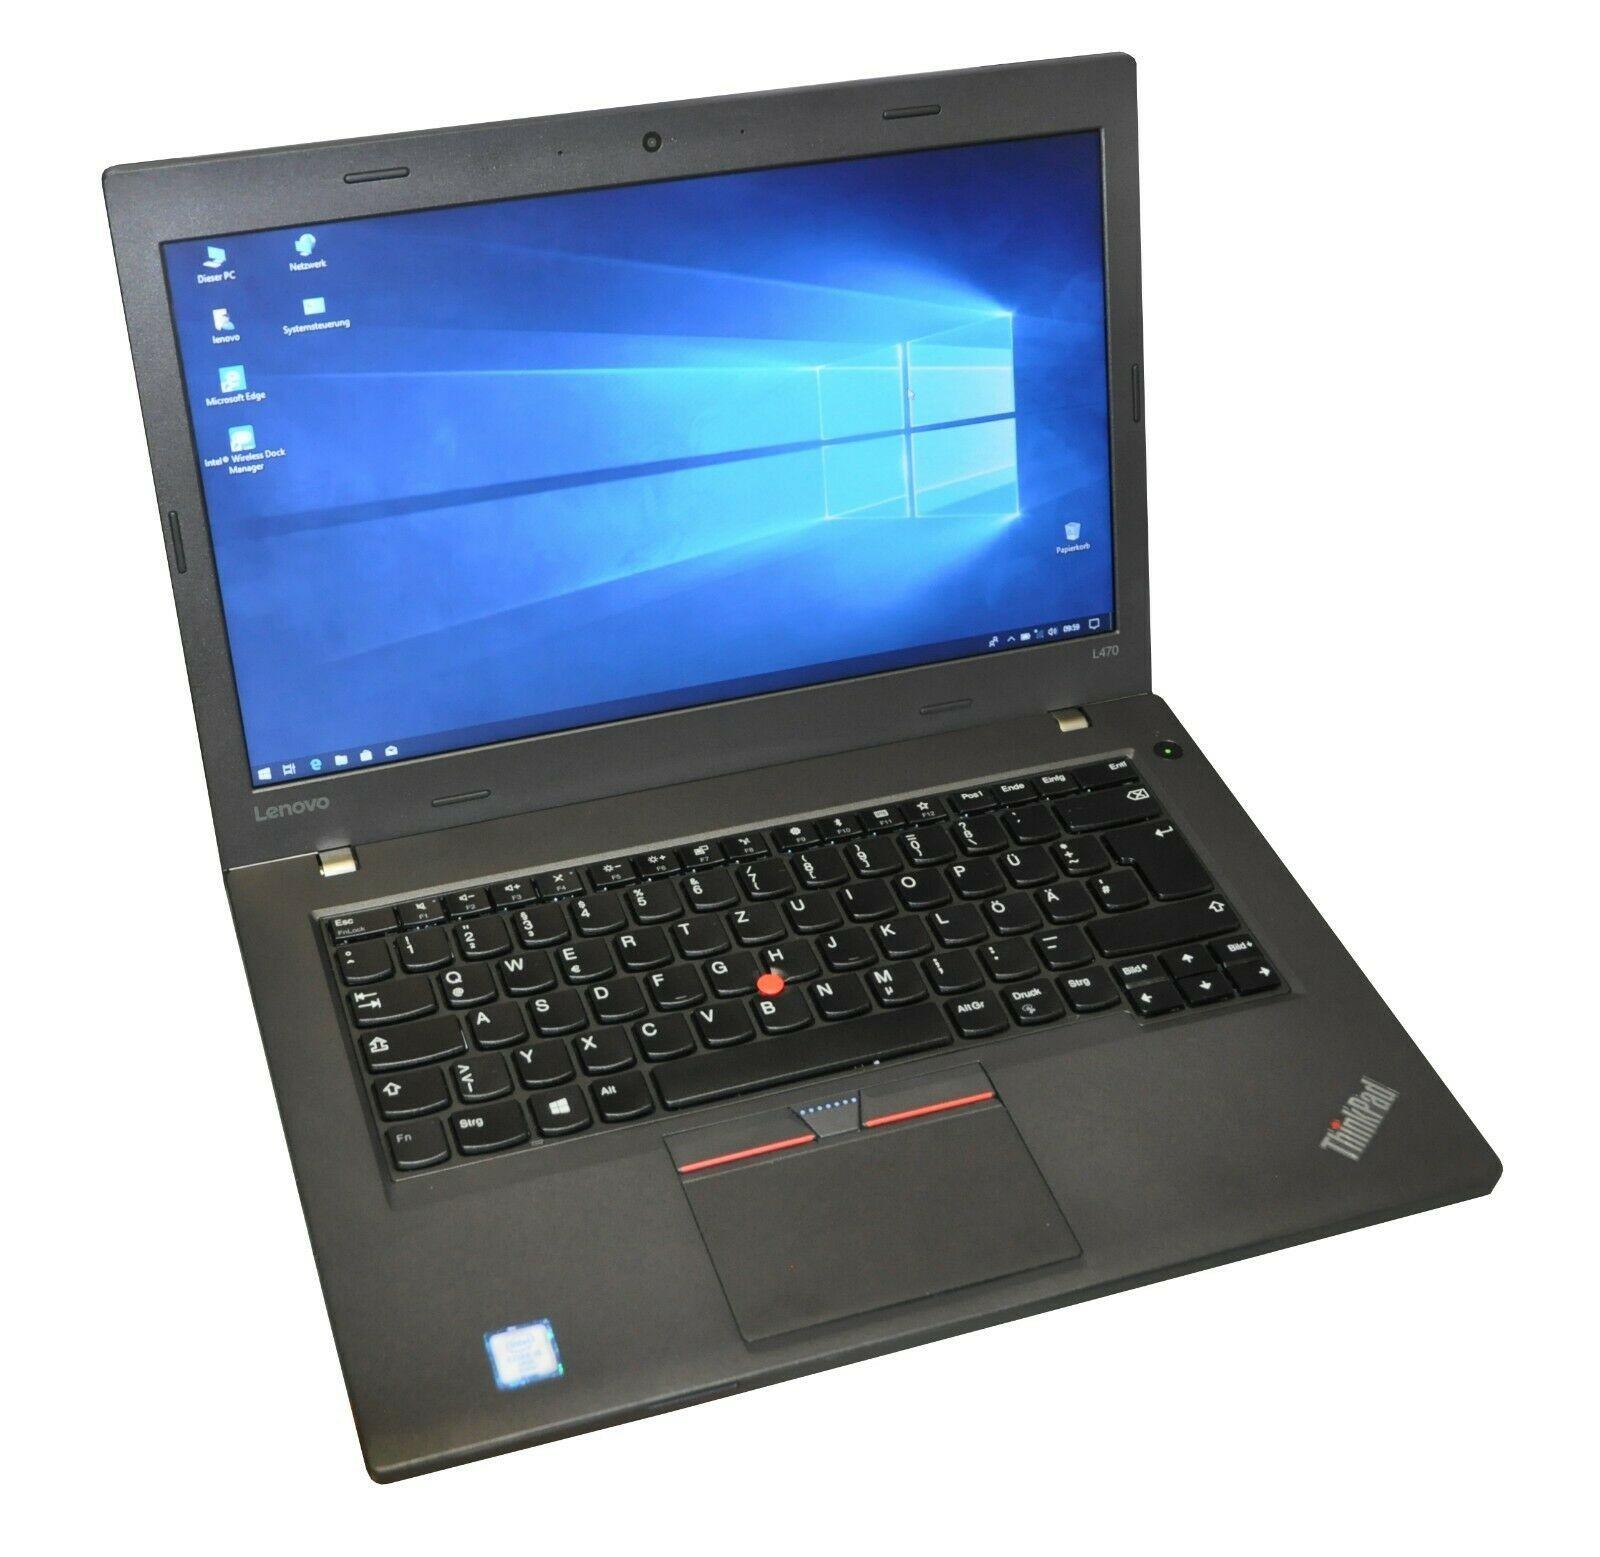 "Lenovo ThinkPad L470 14"" i5 6300U 2,4GHz 8GB DDR4 RAM 256GB SSD Win 10 DE"